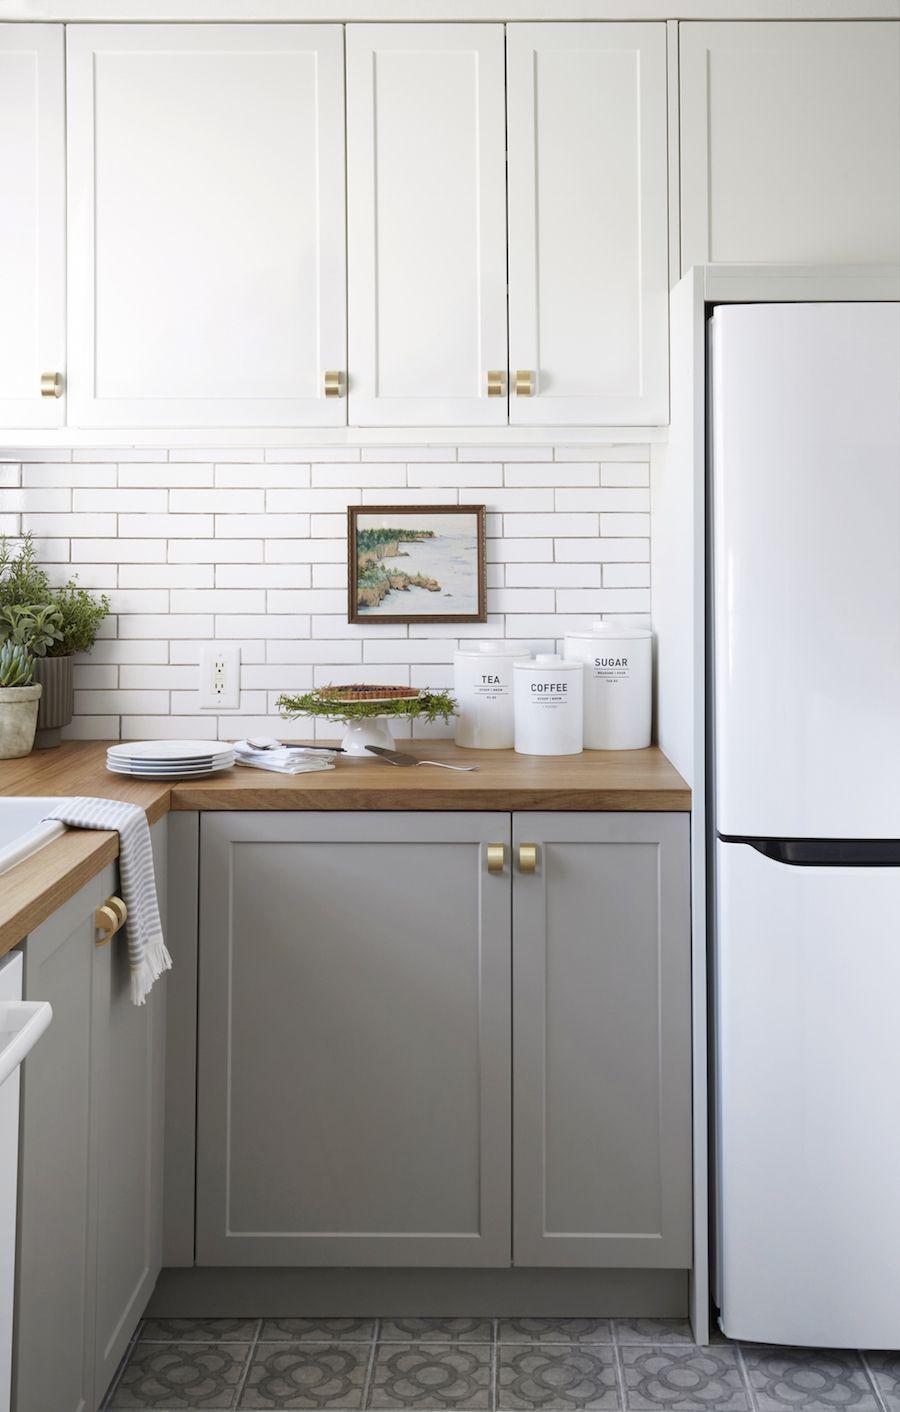 Brass kitchen cabinet knobs via studio mcgee